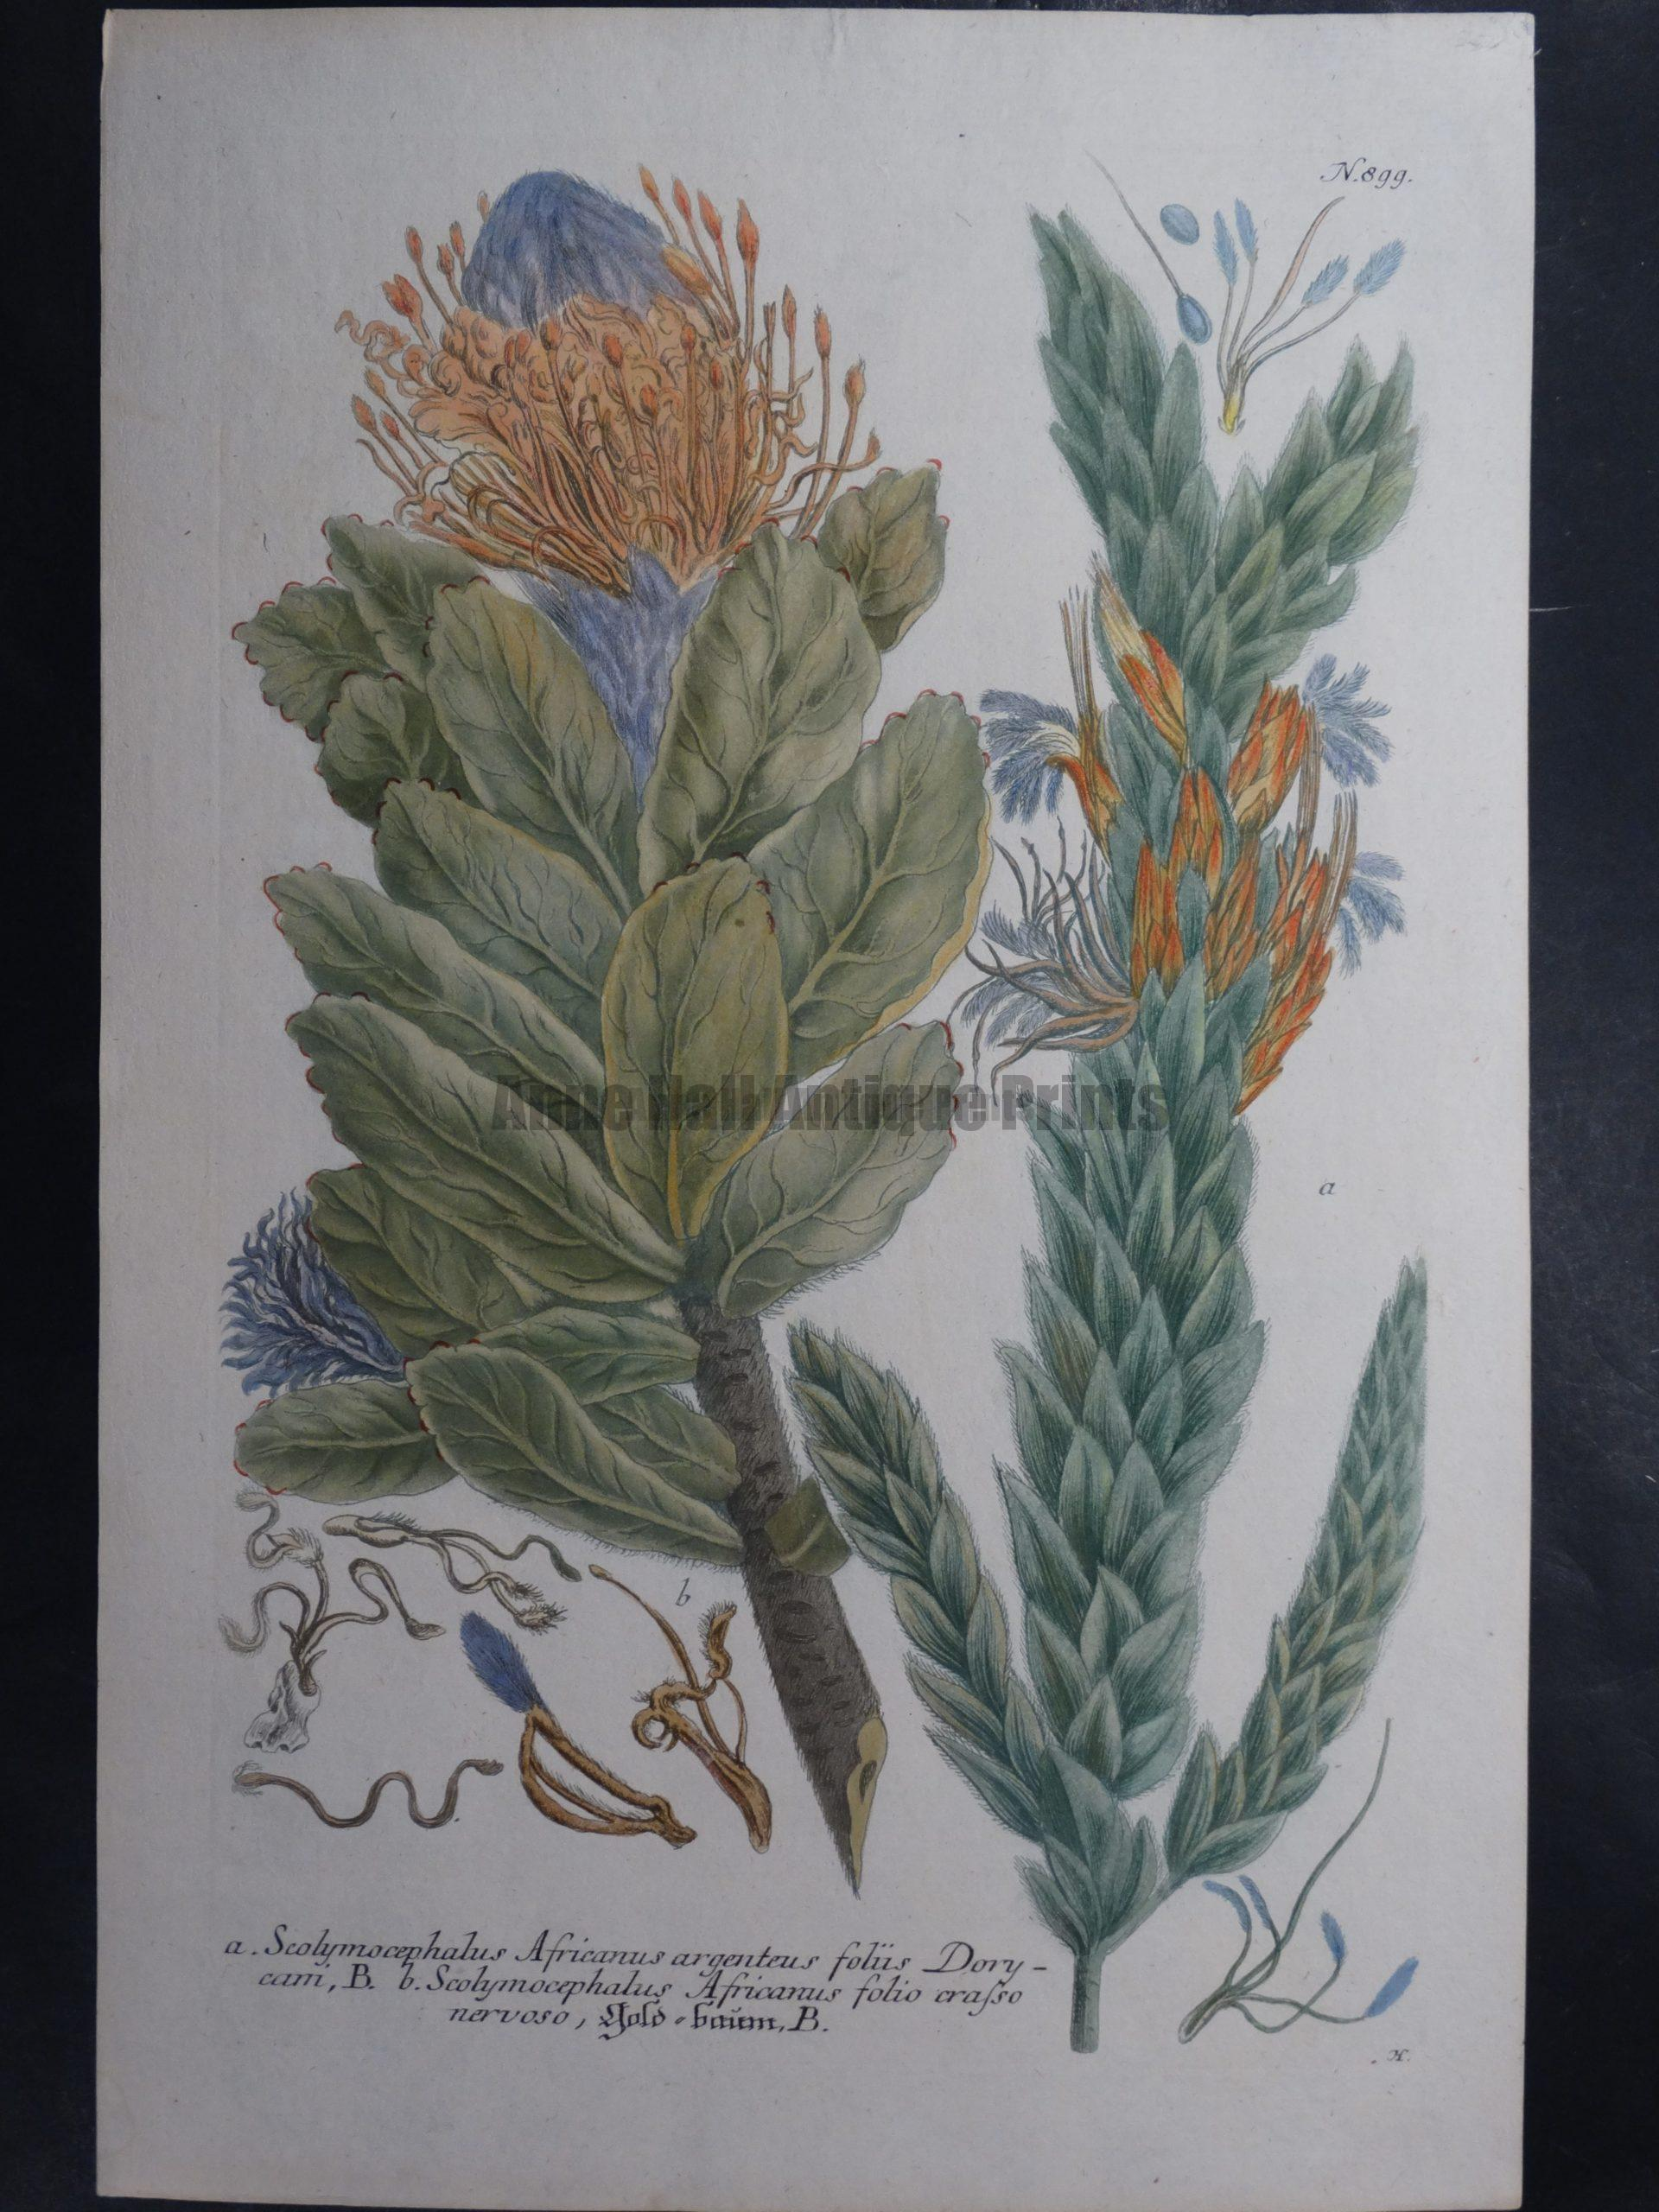 Weinmann Scolymocephalus Johann Wilhelm Weinmann Phytanthoza iconographia. 1737-1745.  9.5x15.25 in.